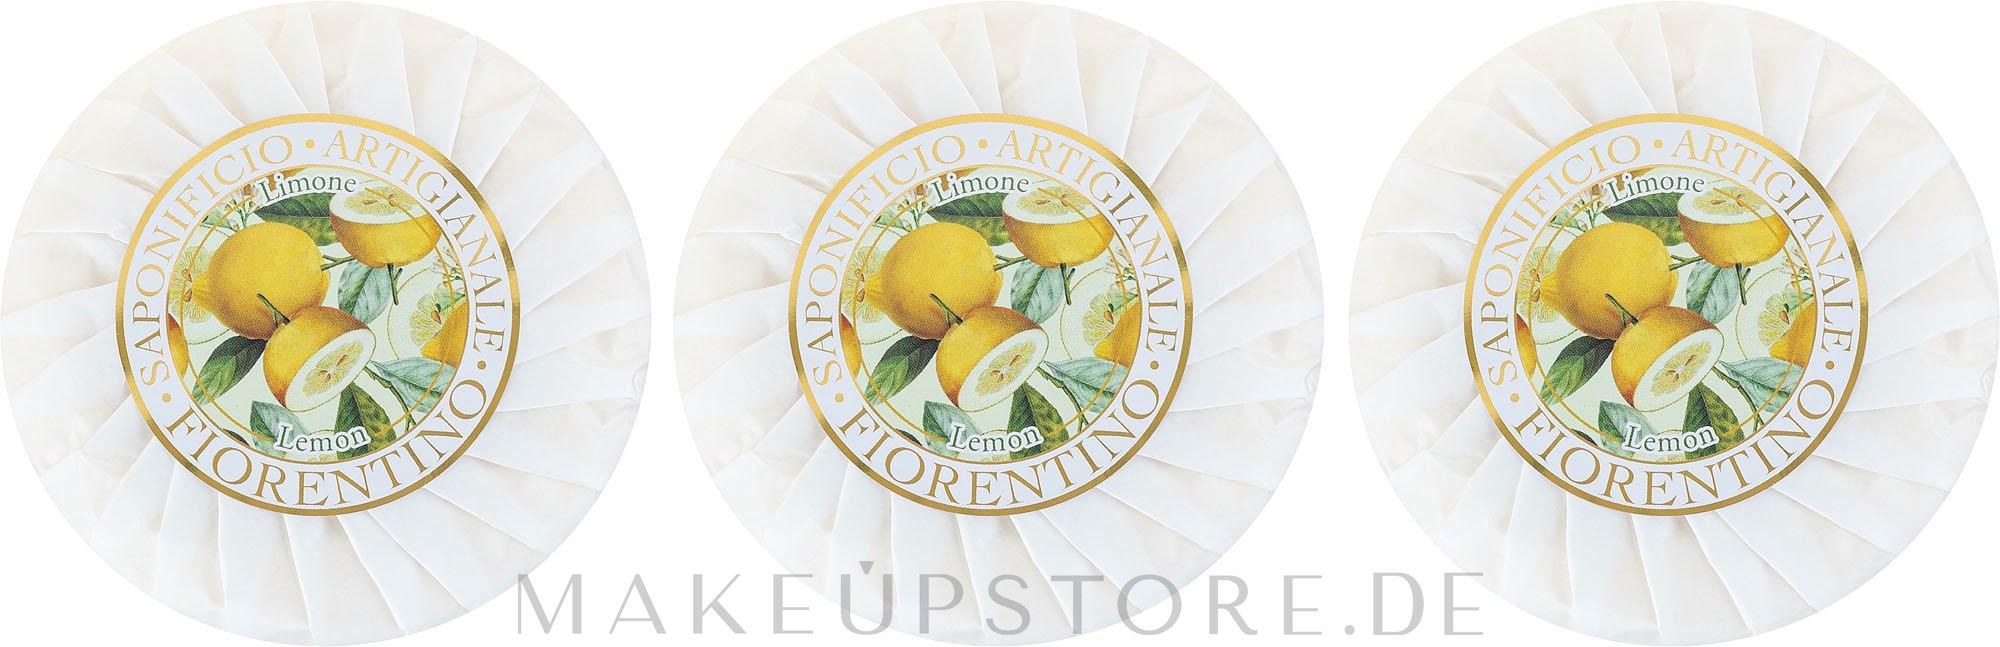 Seifenset Zitrone - Saponificio Artigianale Fiorentino Lemon Soap — Bild 3 x 100 g